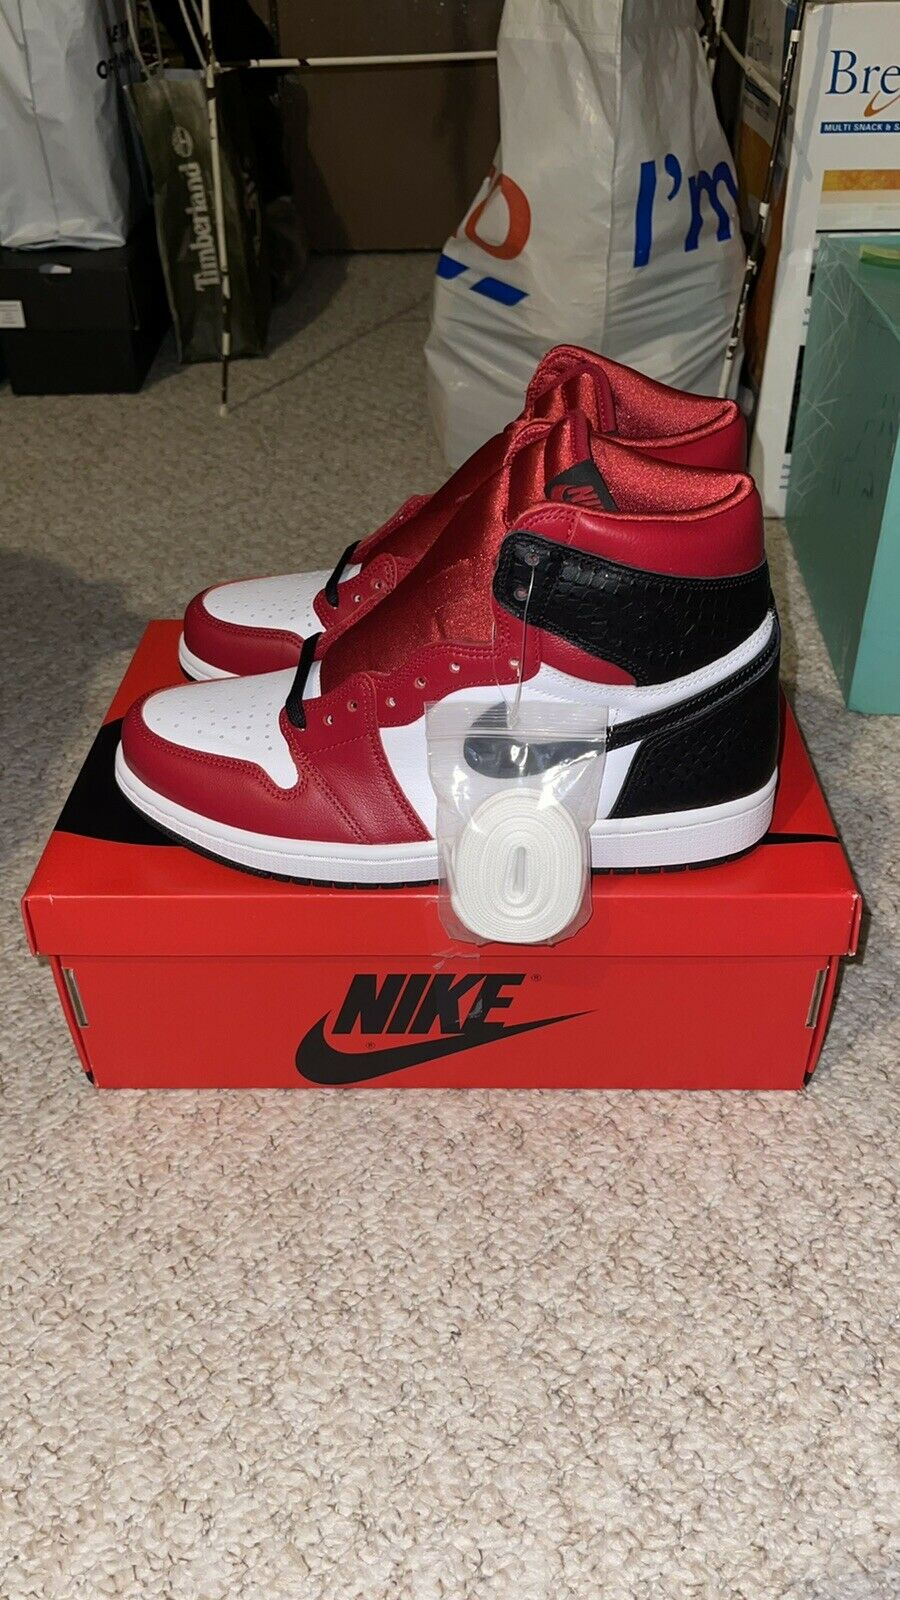 Nike Air Jordan 1 Retro High Satin Snake Chicago UK 6.5 US 9 EU 40.5 *NEW*